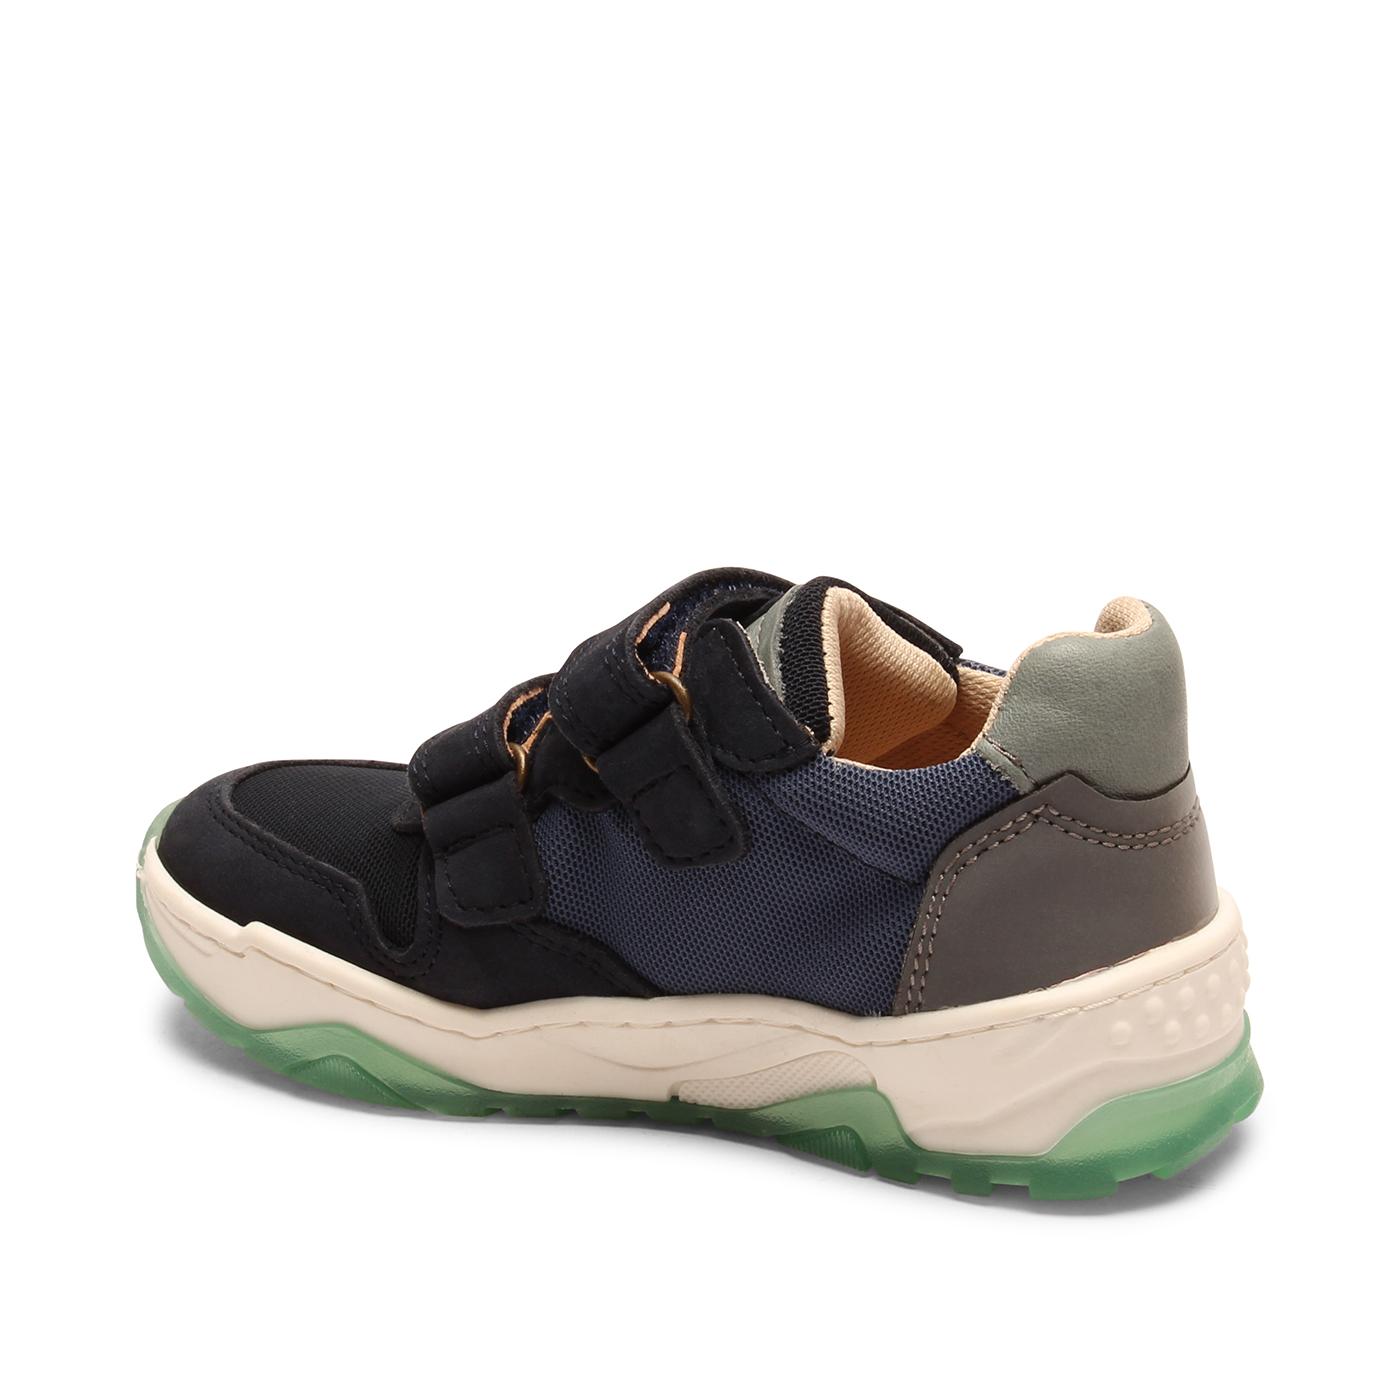 Bisgaard Lauge TEX støvle, navy, 26